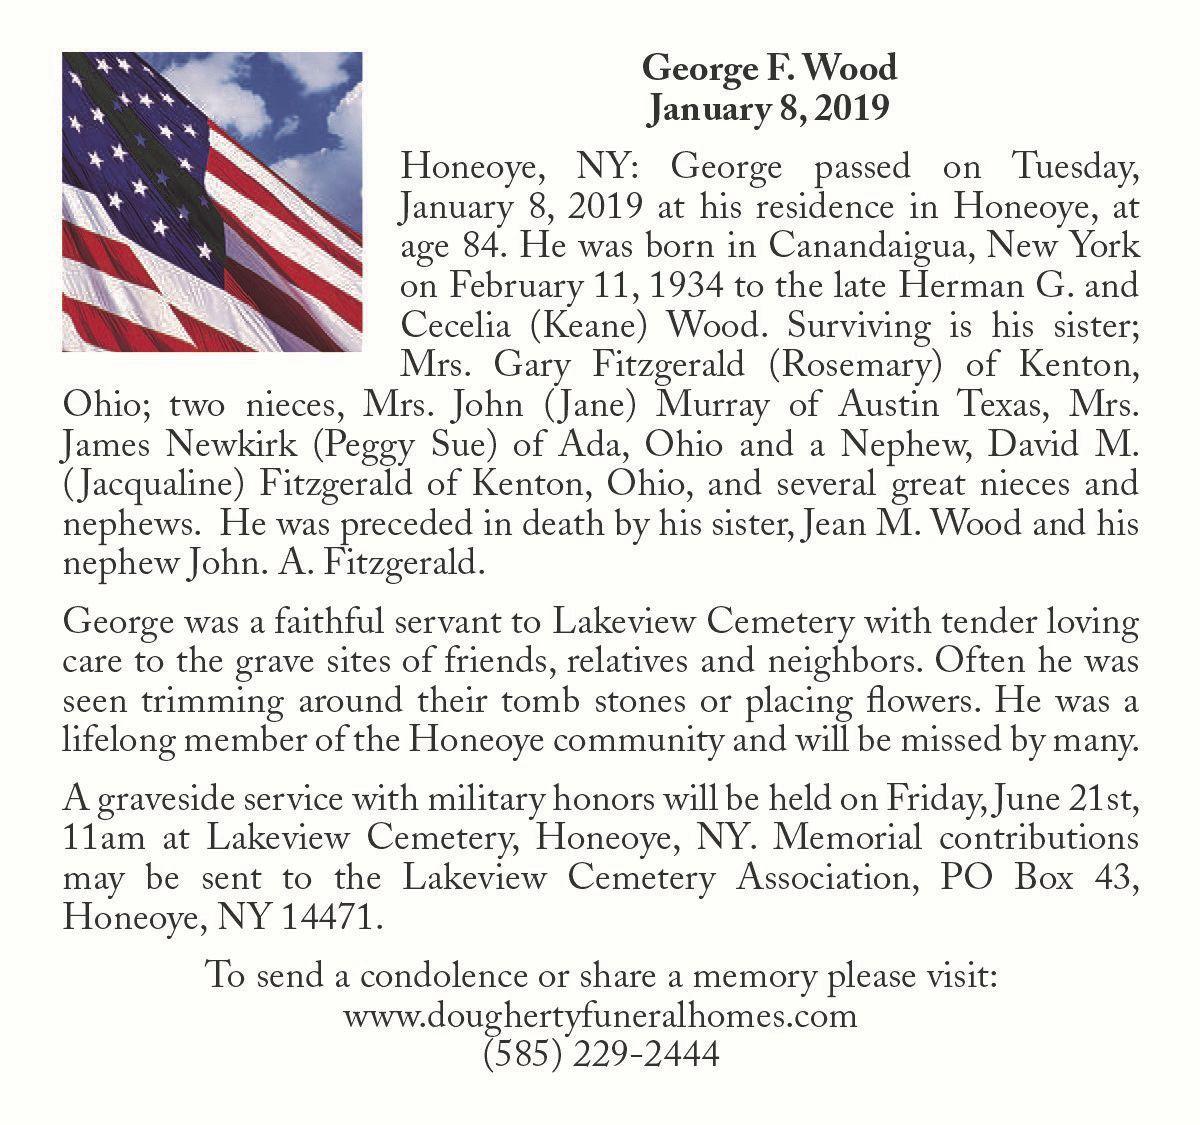 George F. Wood ~ January 8, 2019